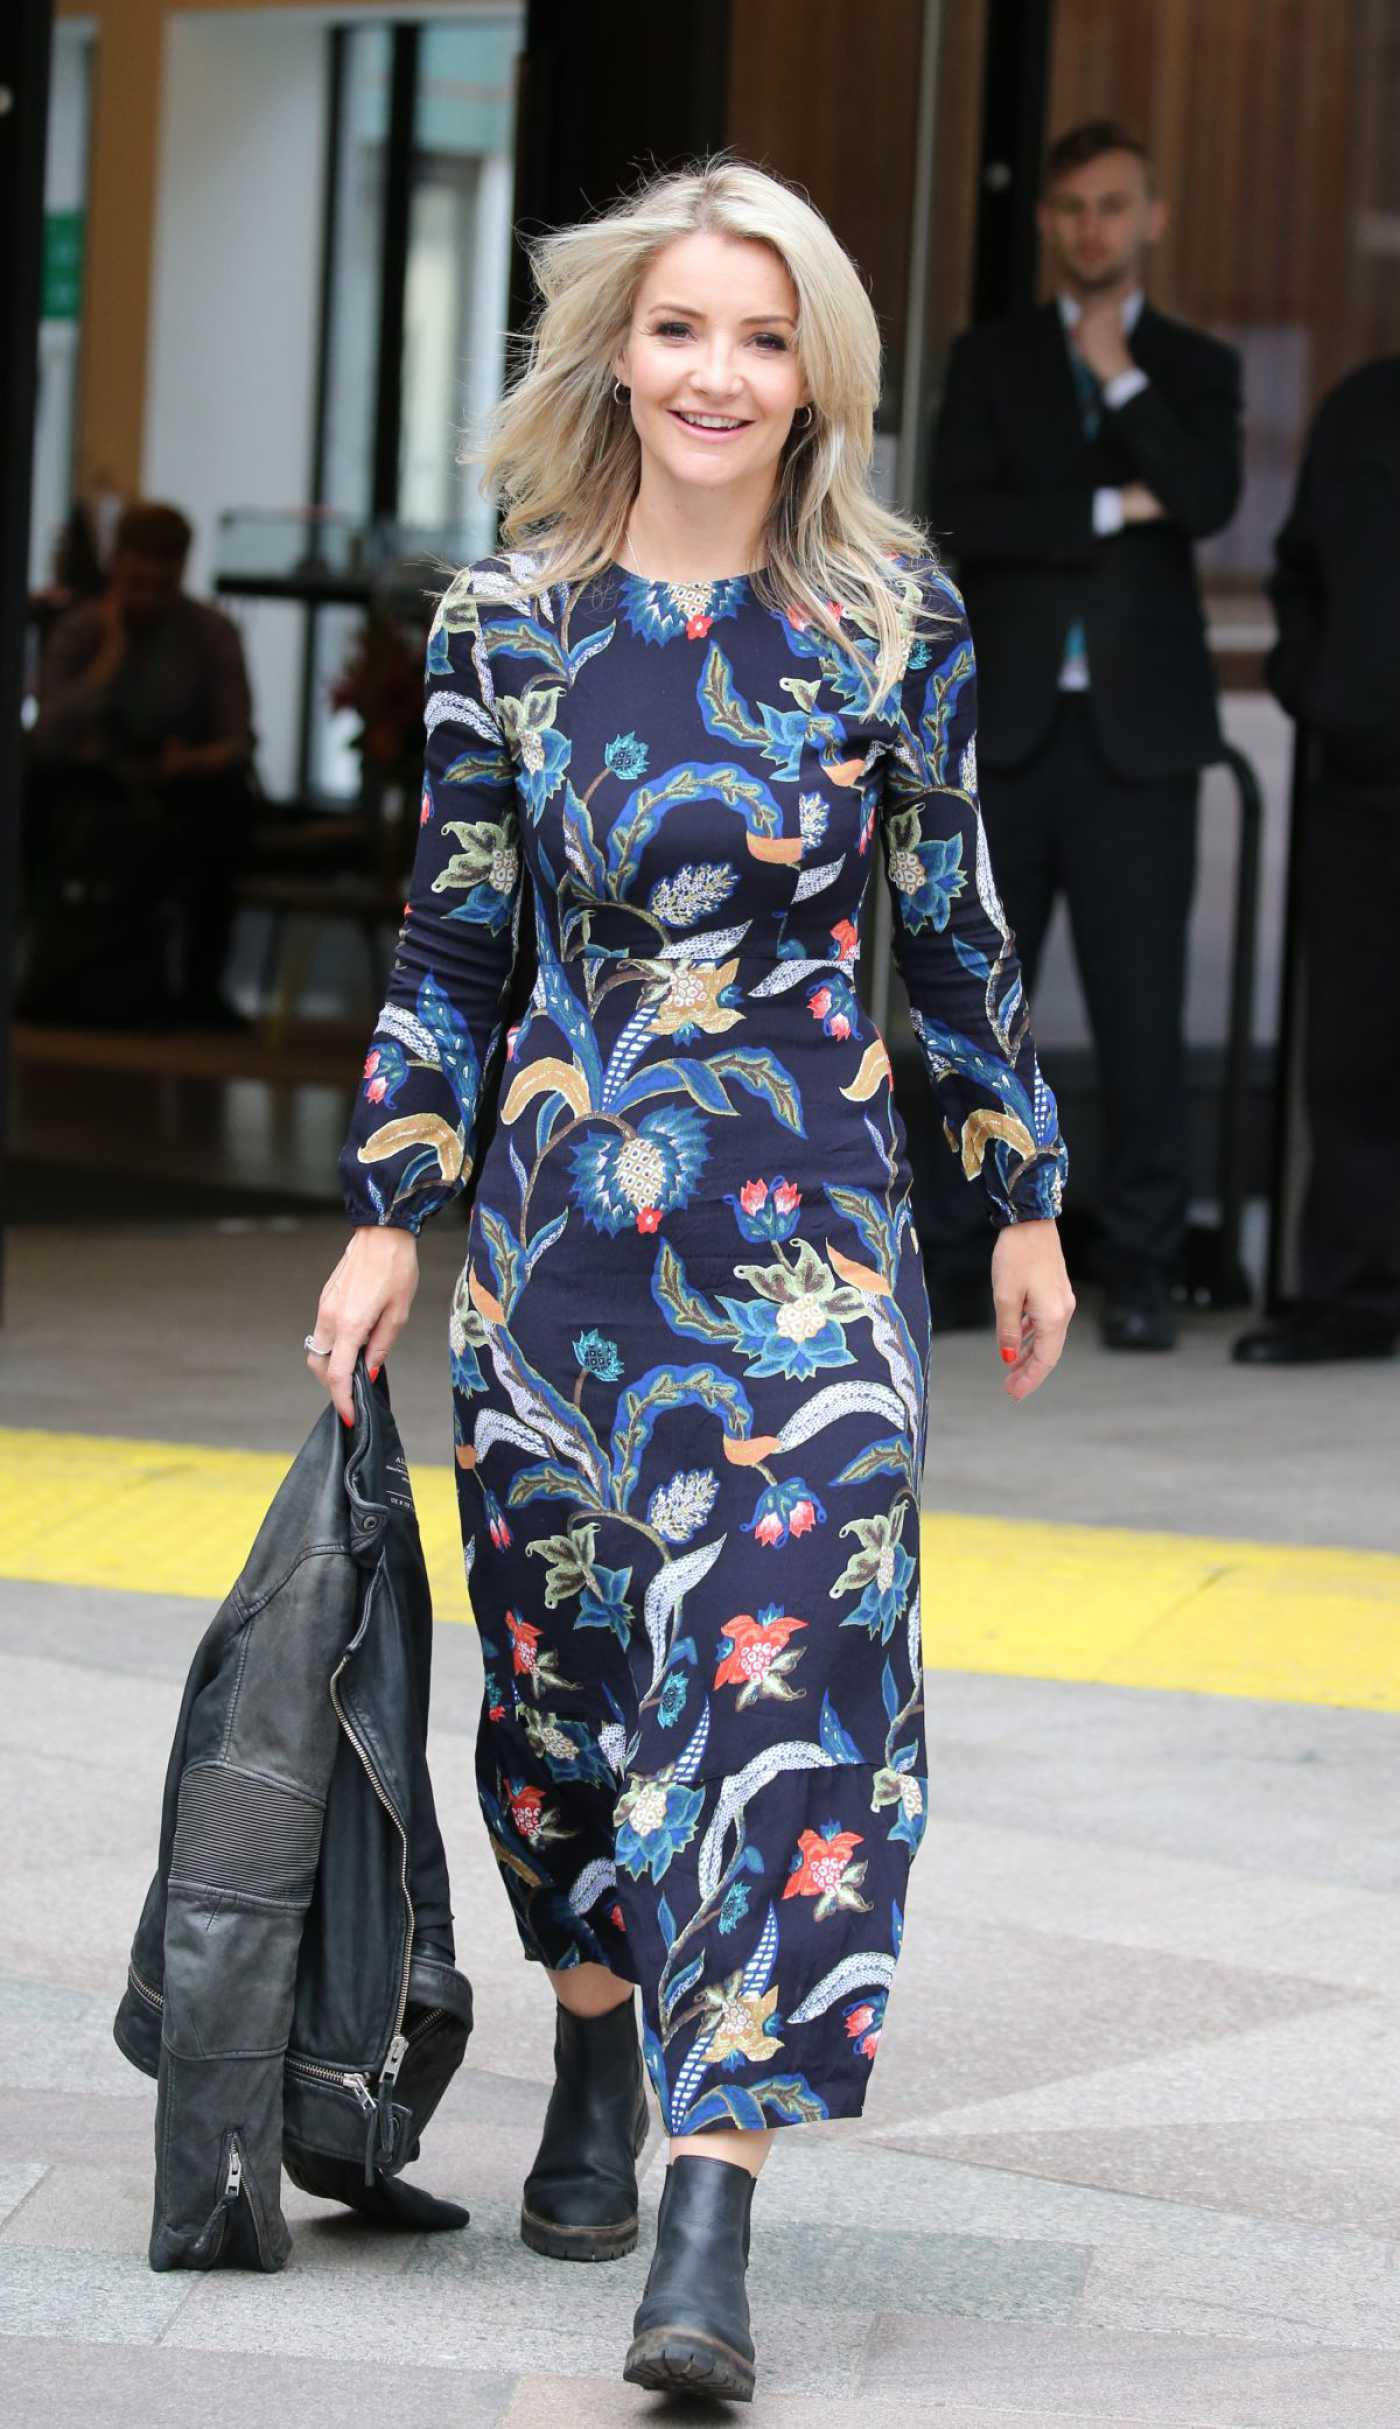 Helen Skelton in a Floral Dress Leaves ITV Studios in London 09/05/2019